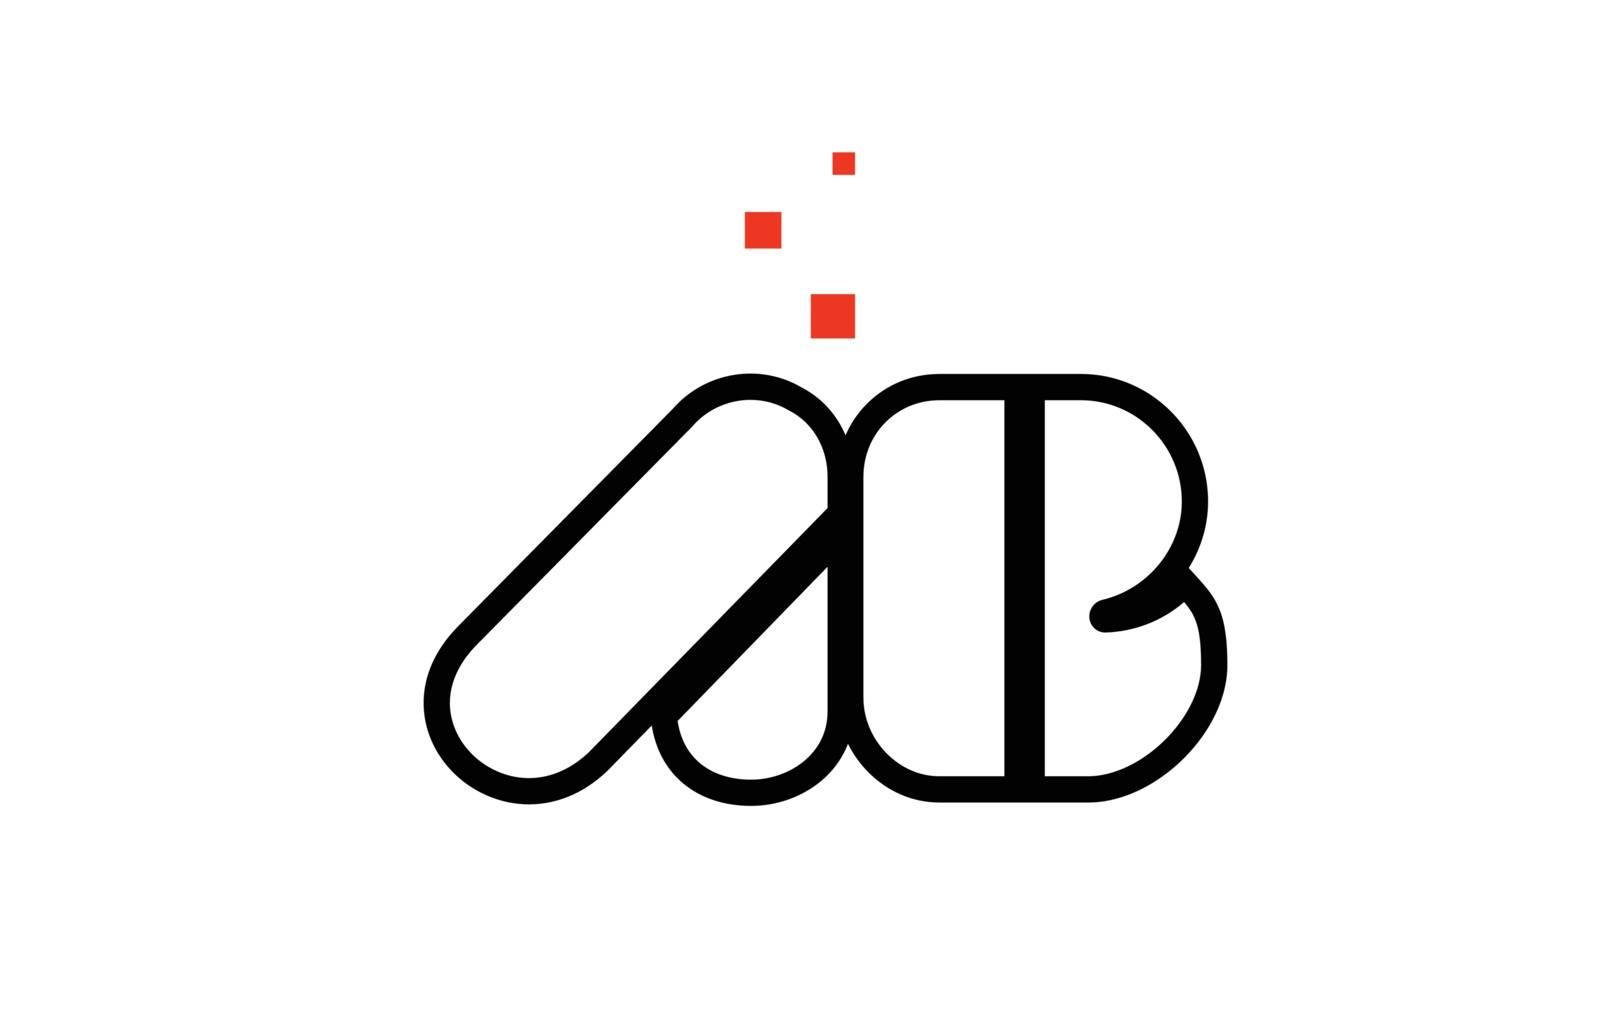 AB A B black white red alphabet letter combination logo icon des by dragomirescu